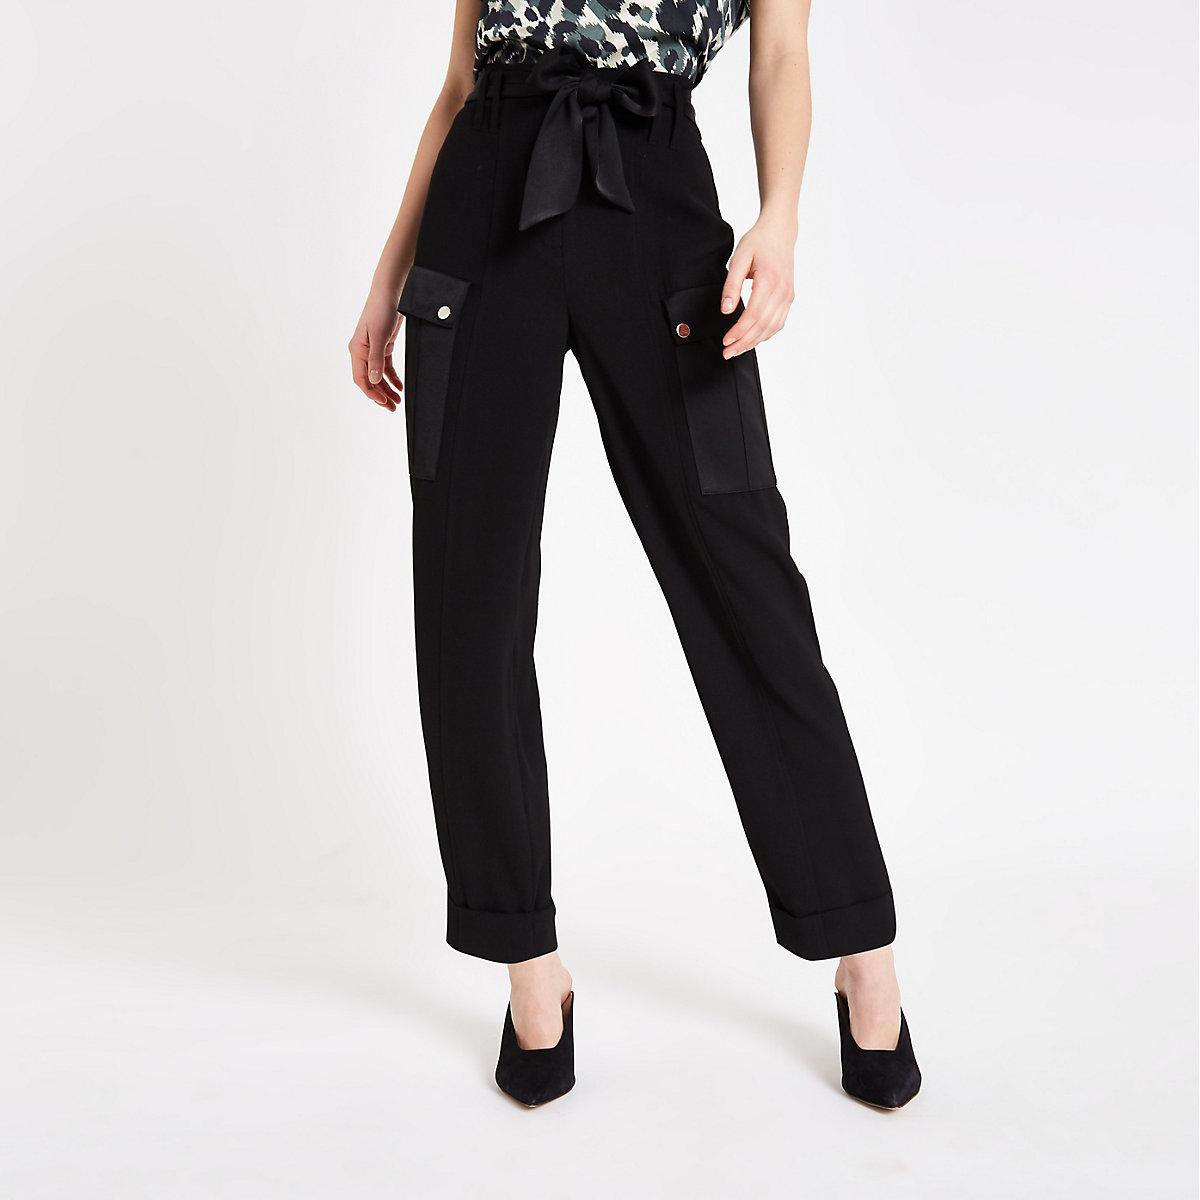 Black utility peg trousers